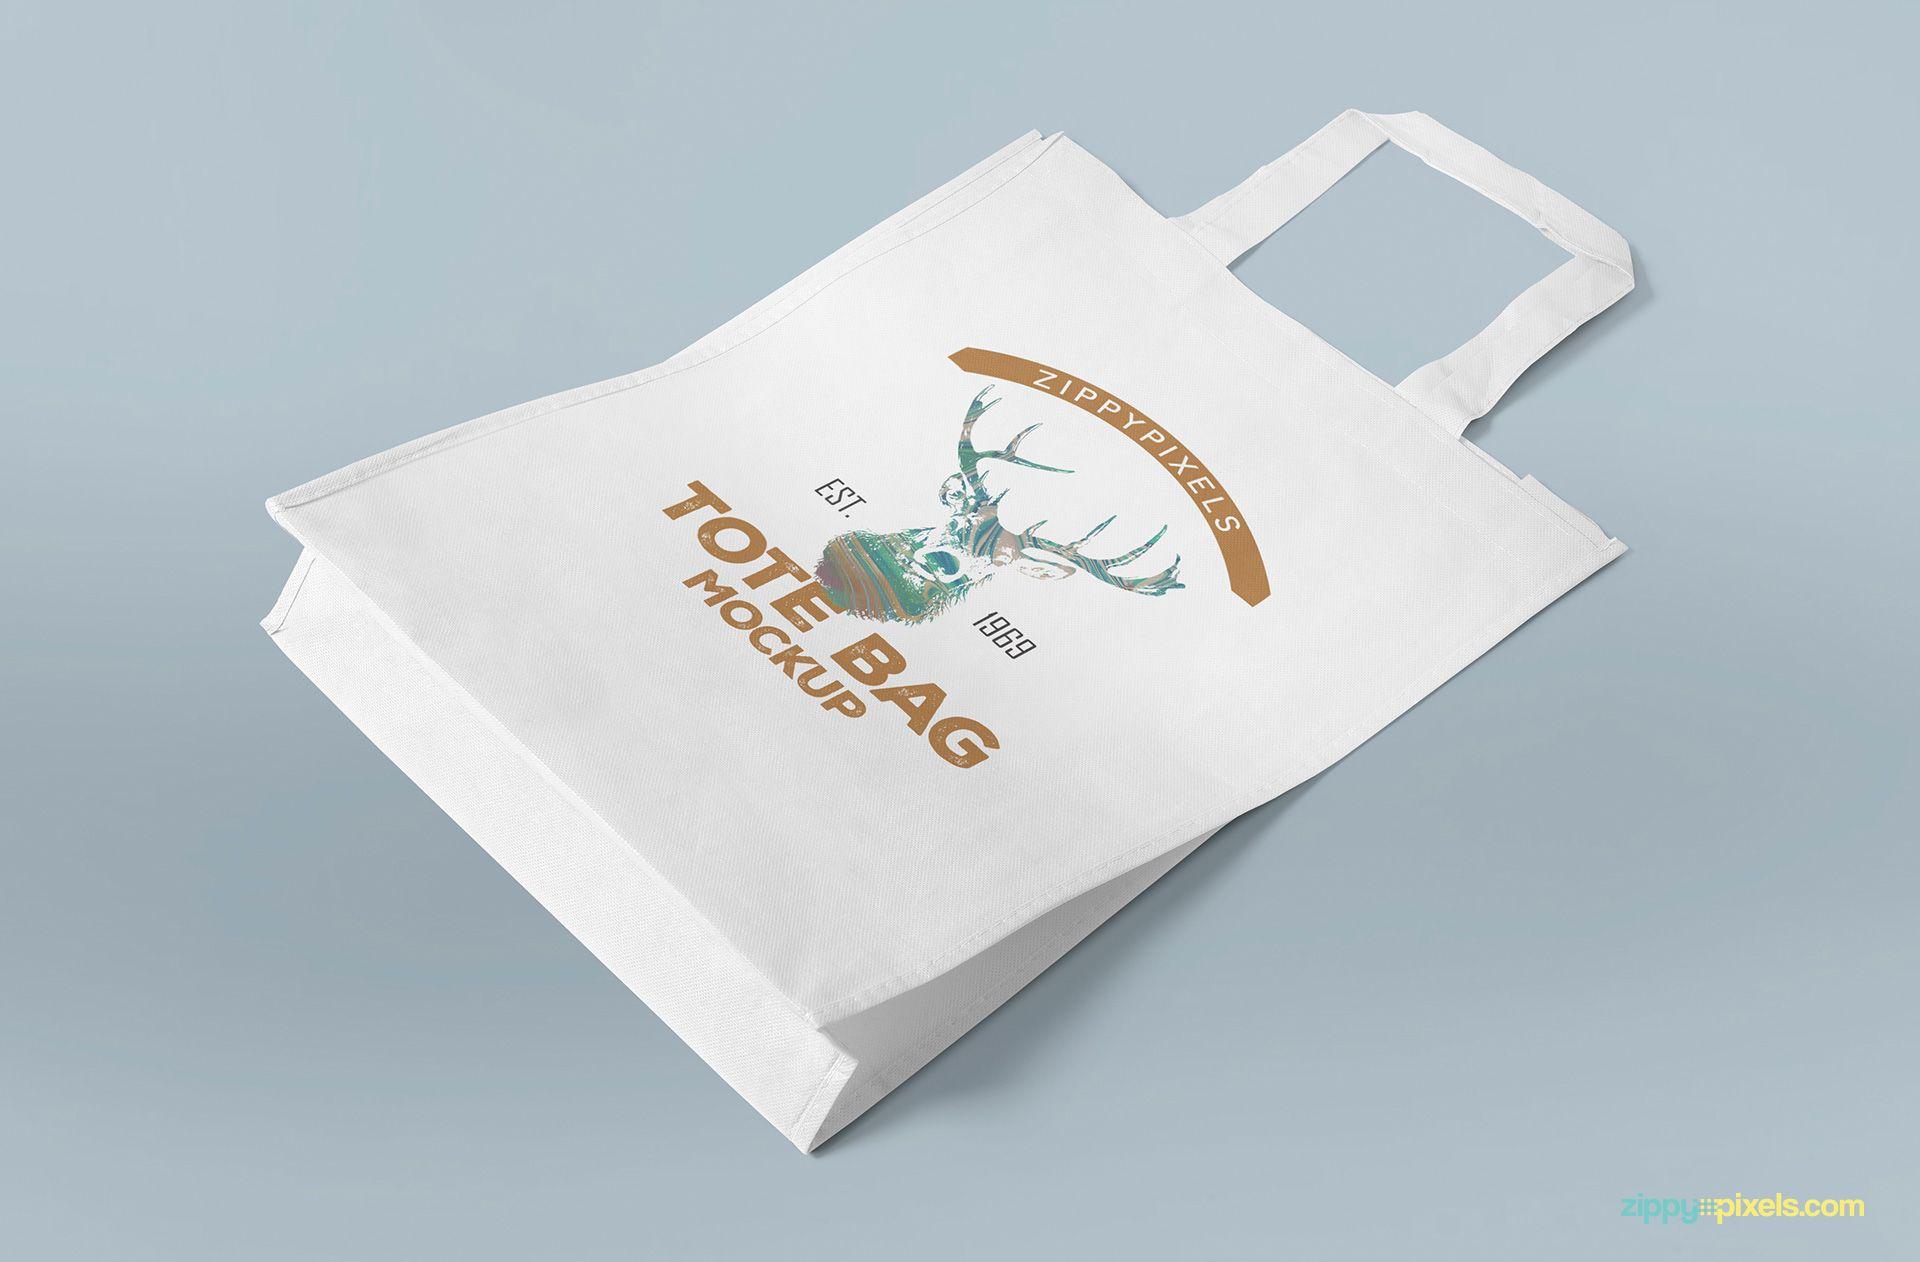 Download Tote Bag Mockups Free Psd Download Zippypixels Bag Mockup Tote Bag Bags